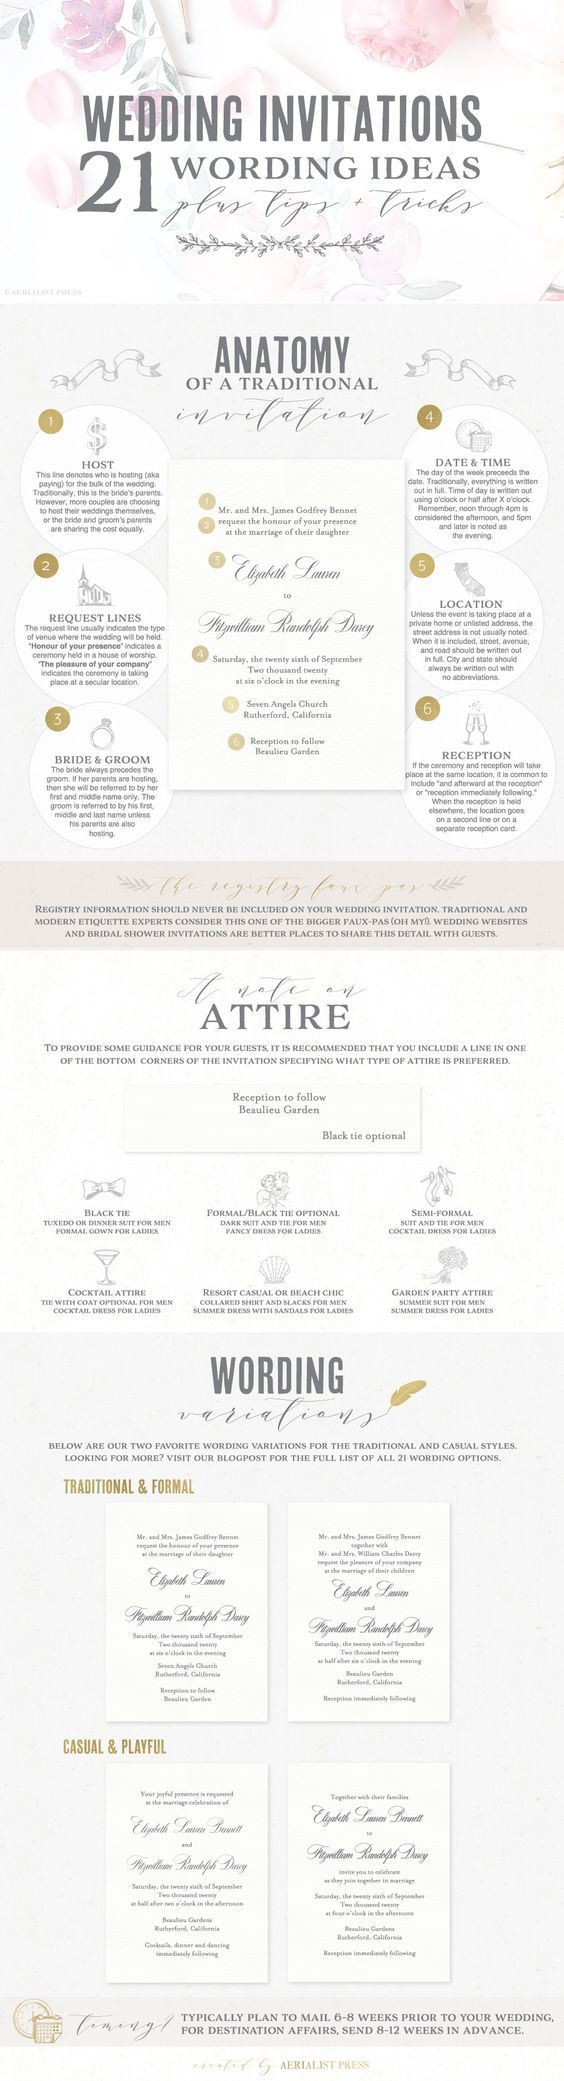 The Backyard Wedding: Modern Paper Invitations http://www.thebackyardwedding.com/modernpaperinvitations/